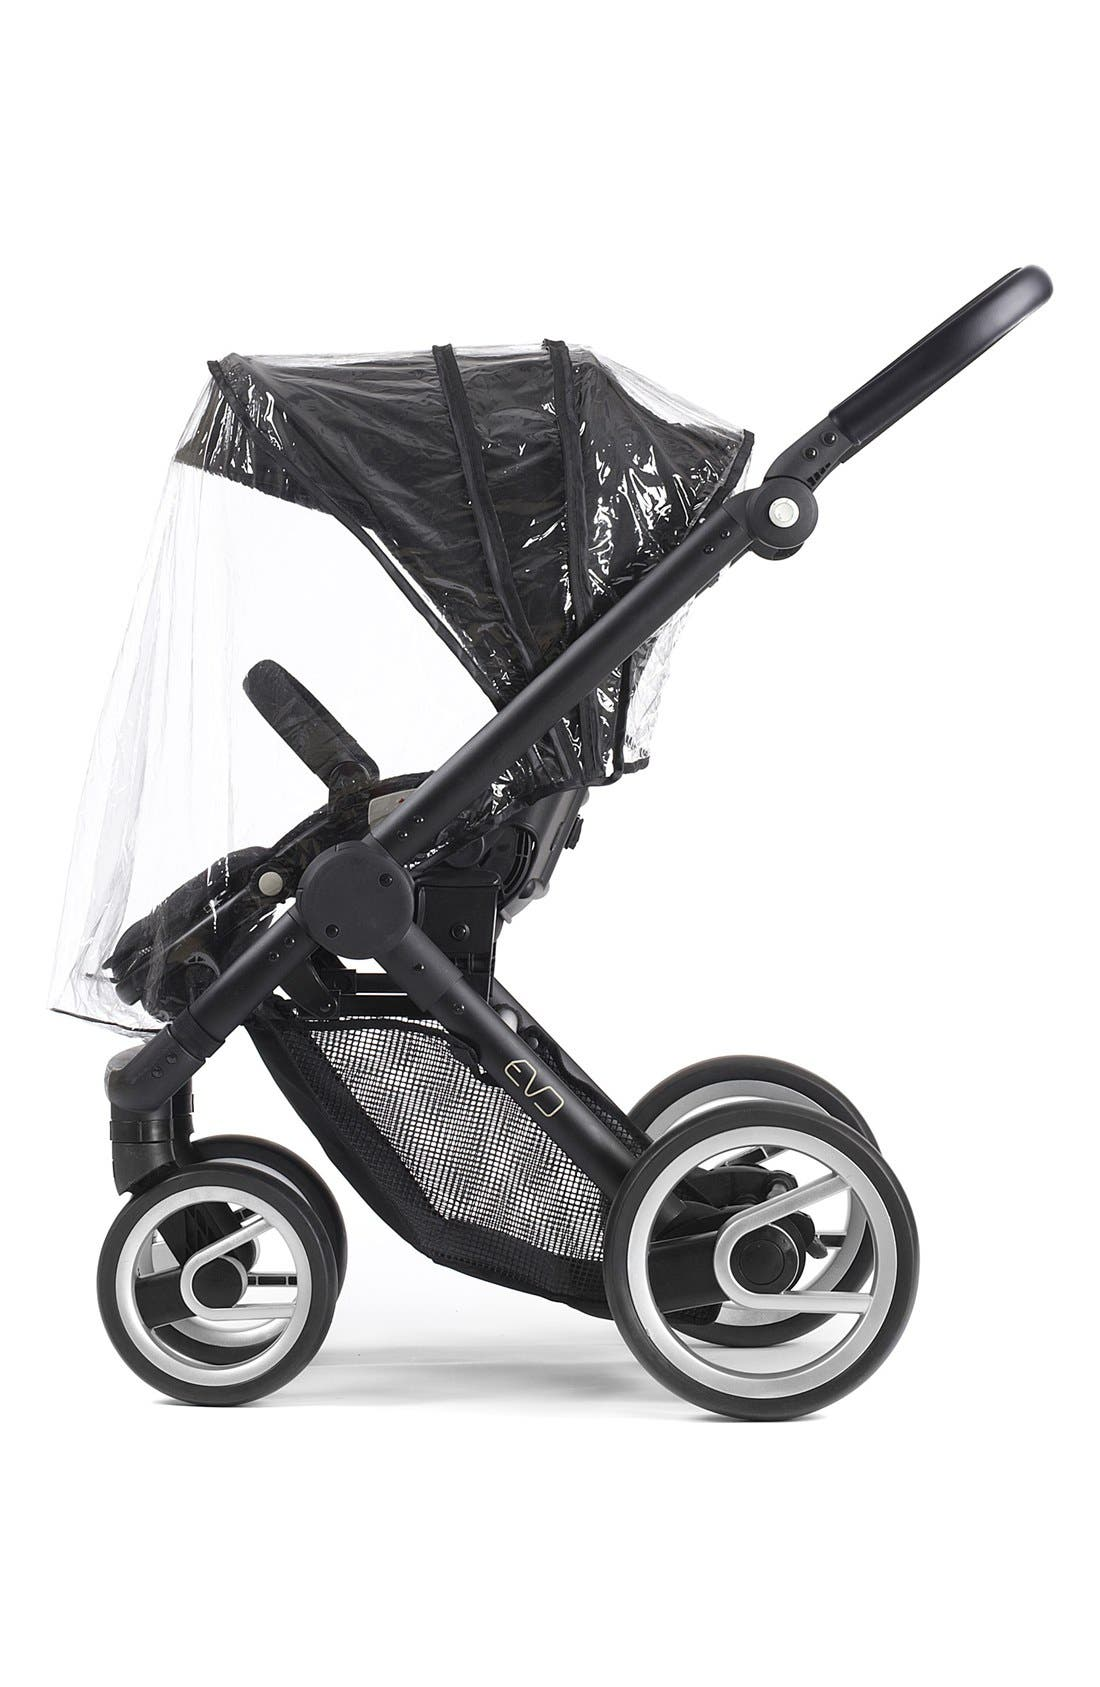 Mutsy 'Evo' Stroller Seat Rain Cover